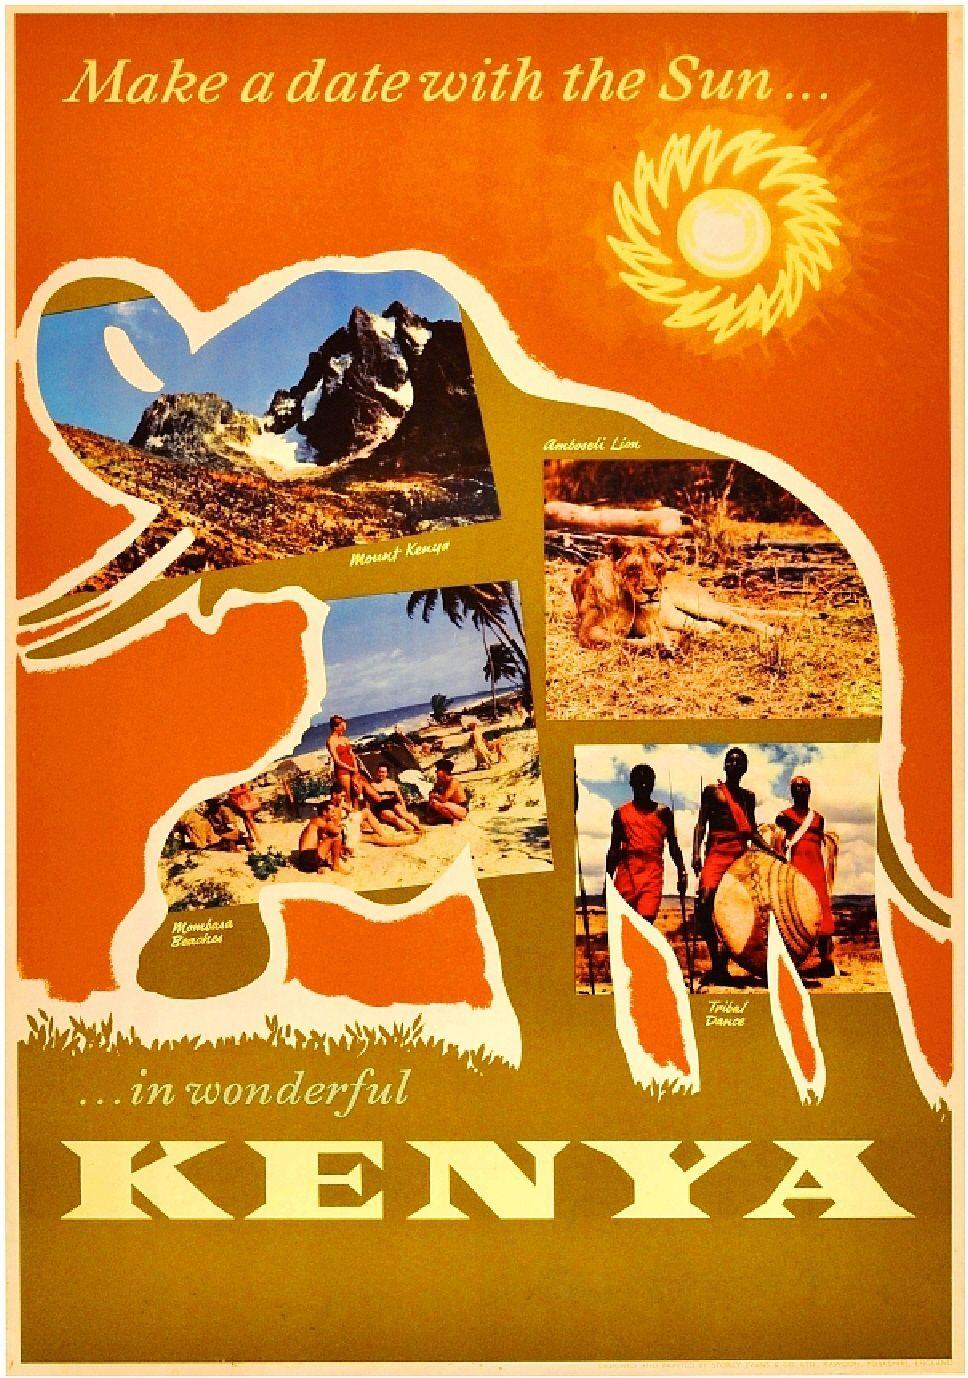 $8.79 - Kenya Africa Elephant Nairobi Vintage African Travel Advertisement  Art Poster #ebay #Collectibles